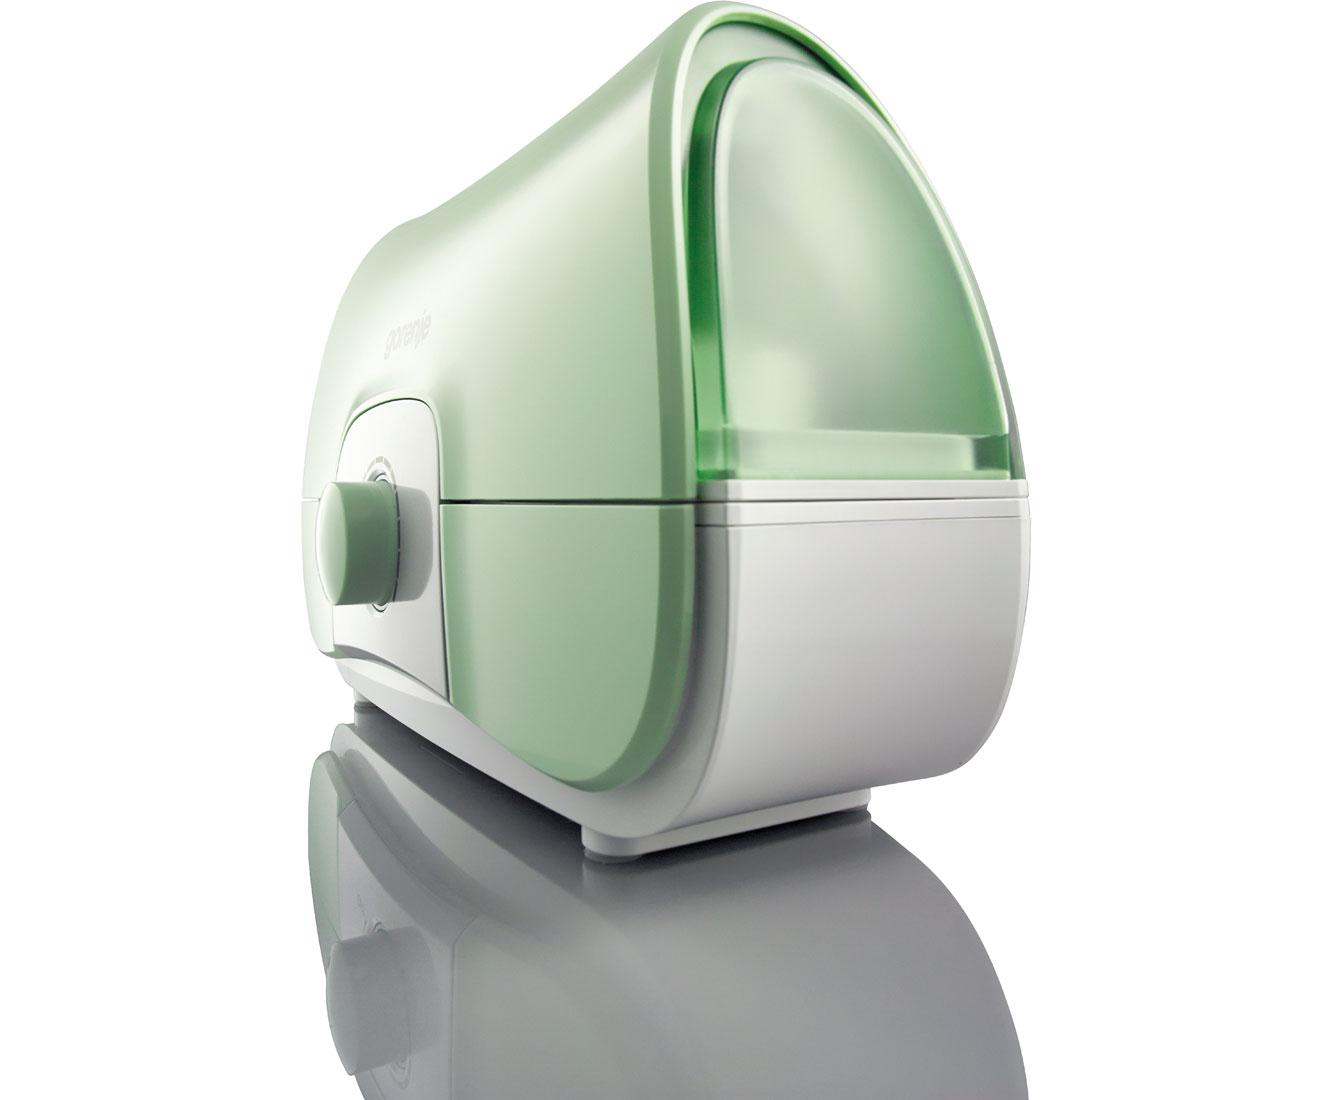 Gorenje H17g Luftbefeuchter Mit Ultraschall Technologie Hellgrun